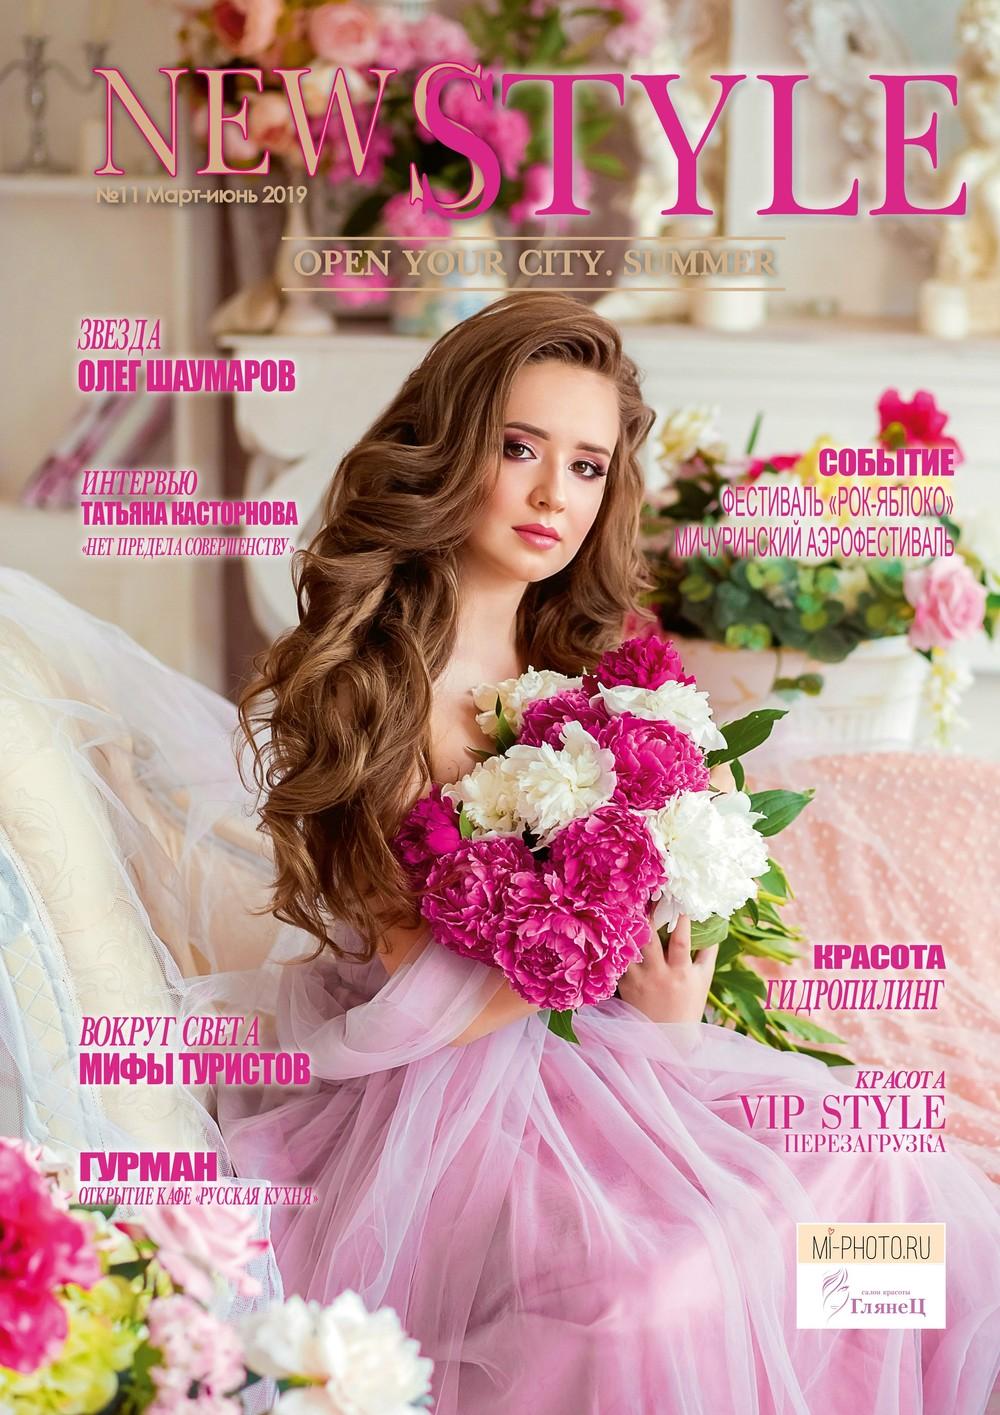 NEWSTYLE №11 Март-июнь 2019